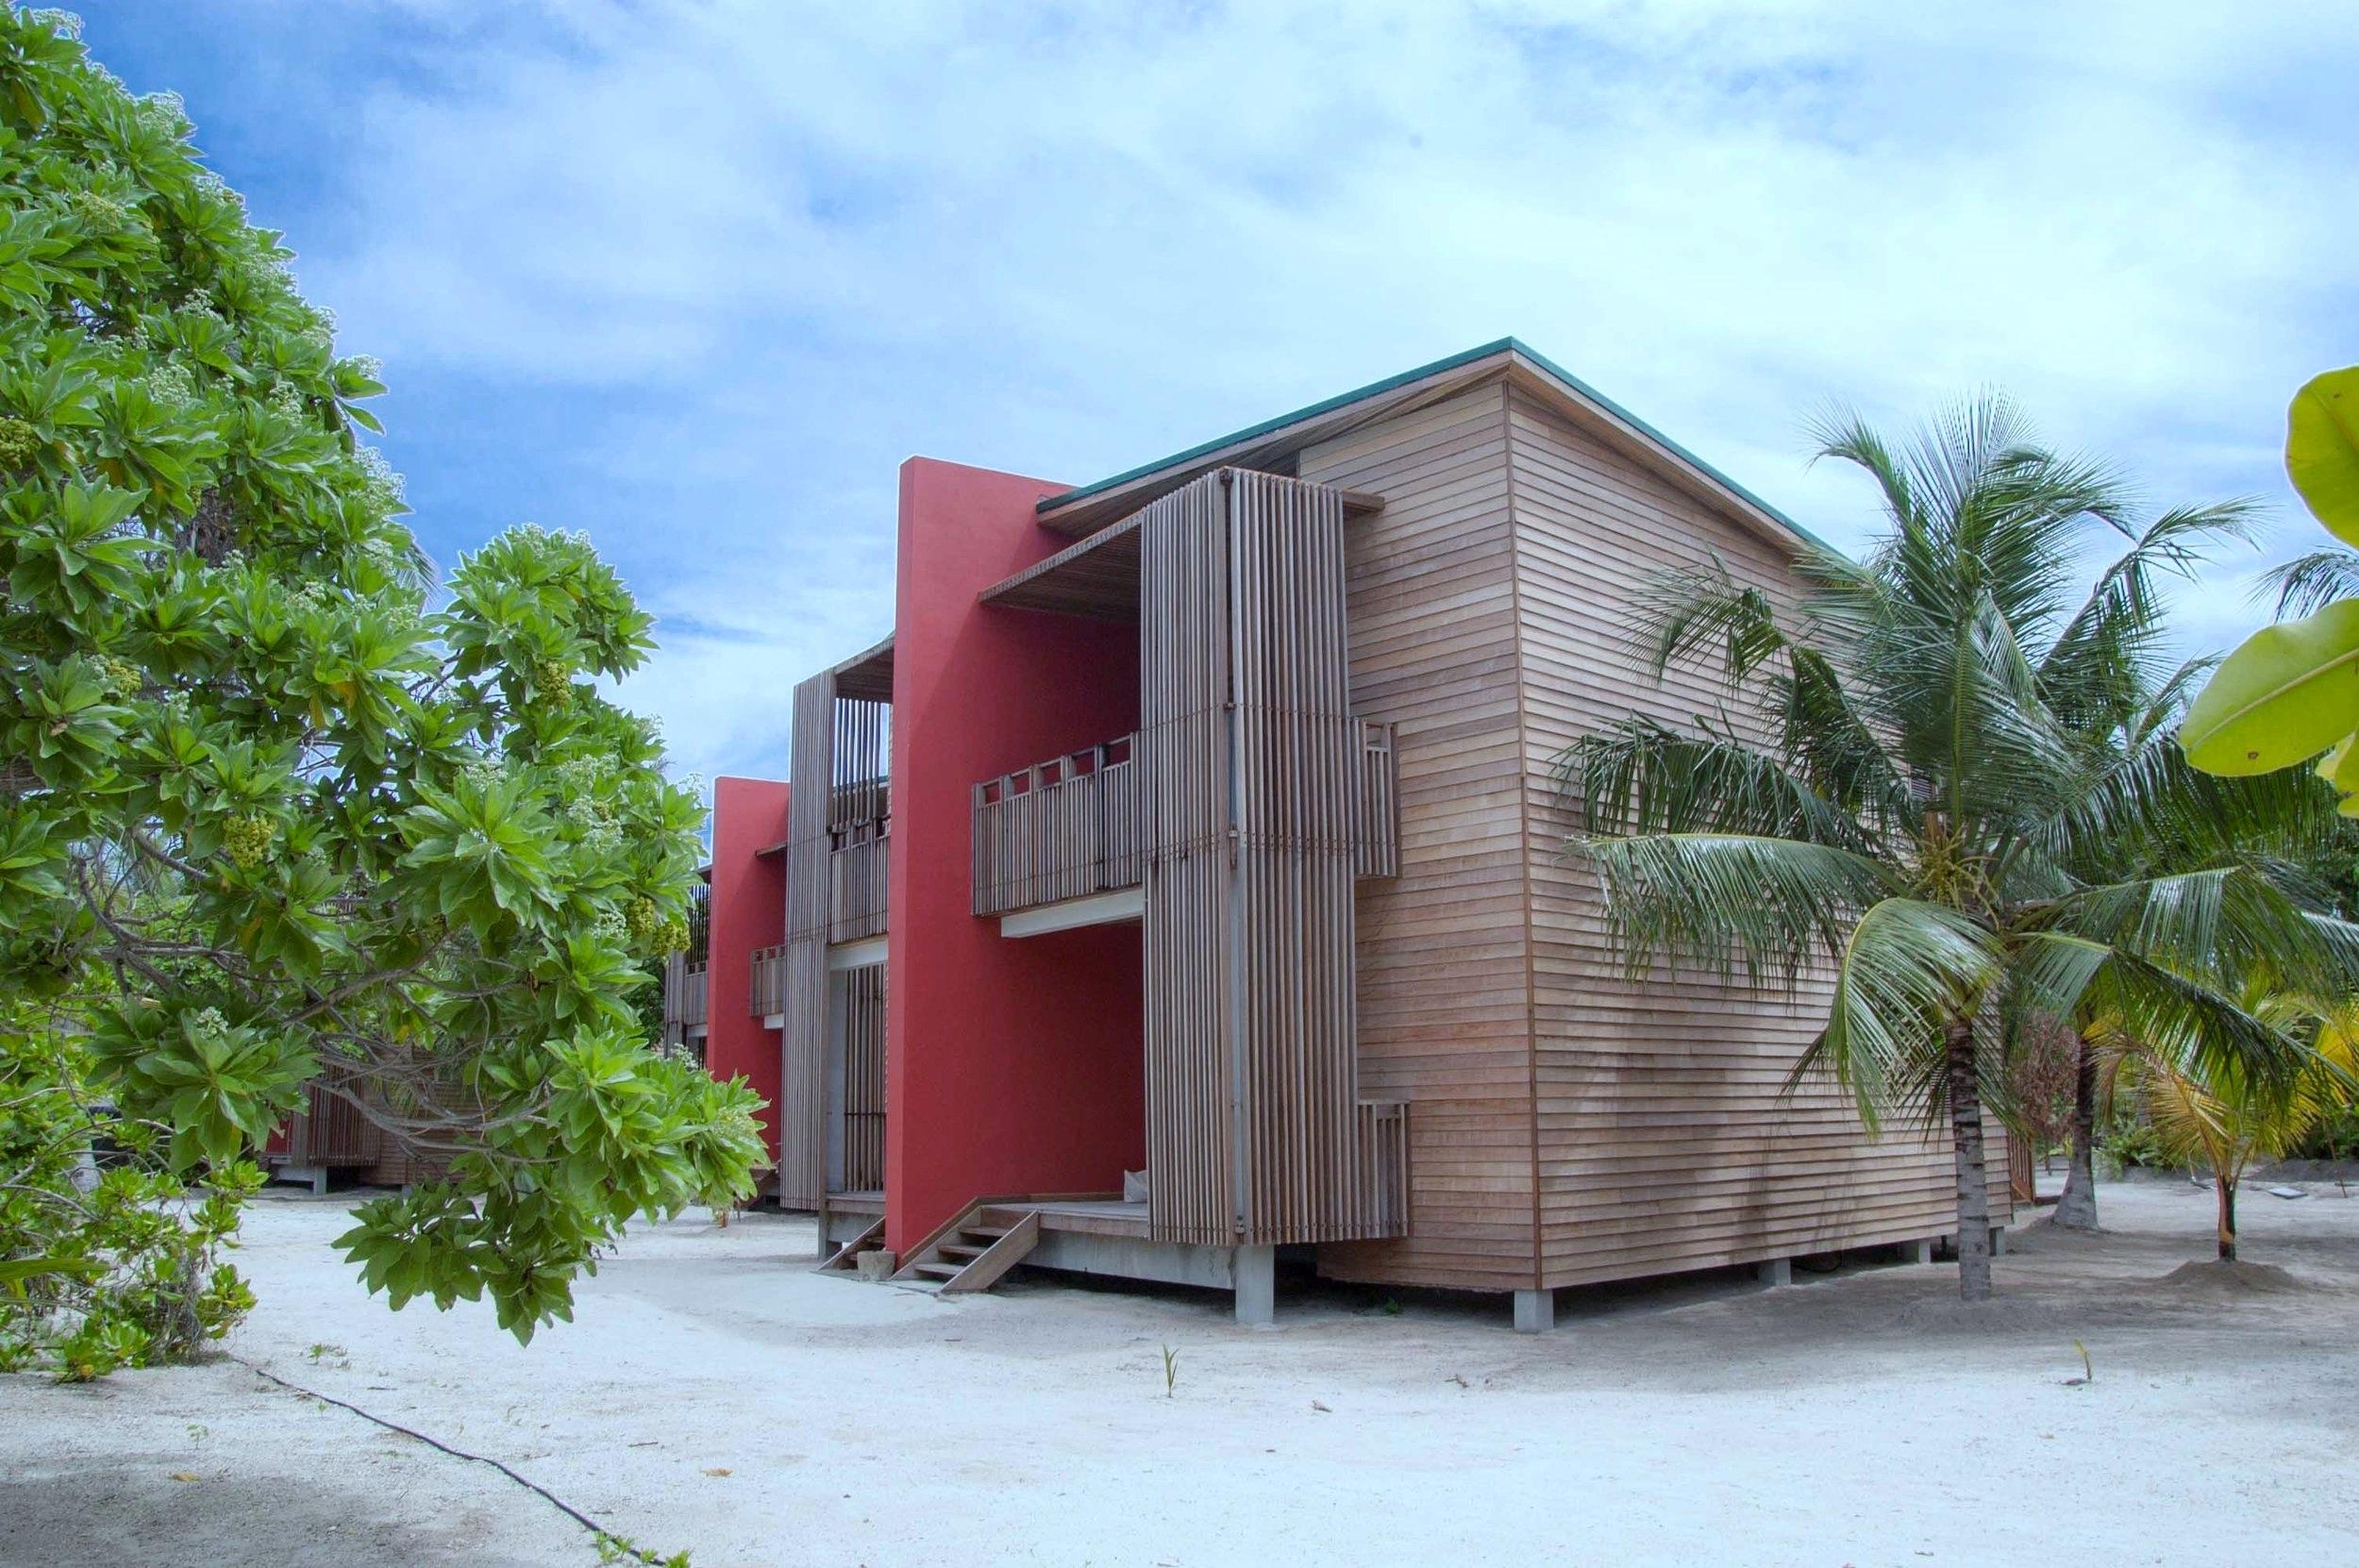 Barefoot_Resort-Maldive-Camere-Wadi_Destination.jpg